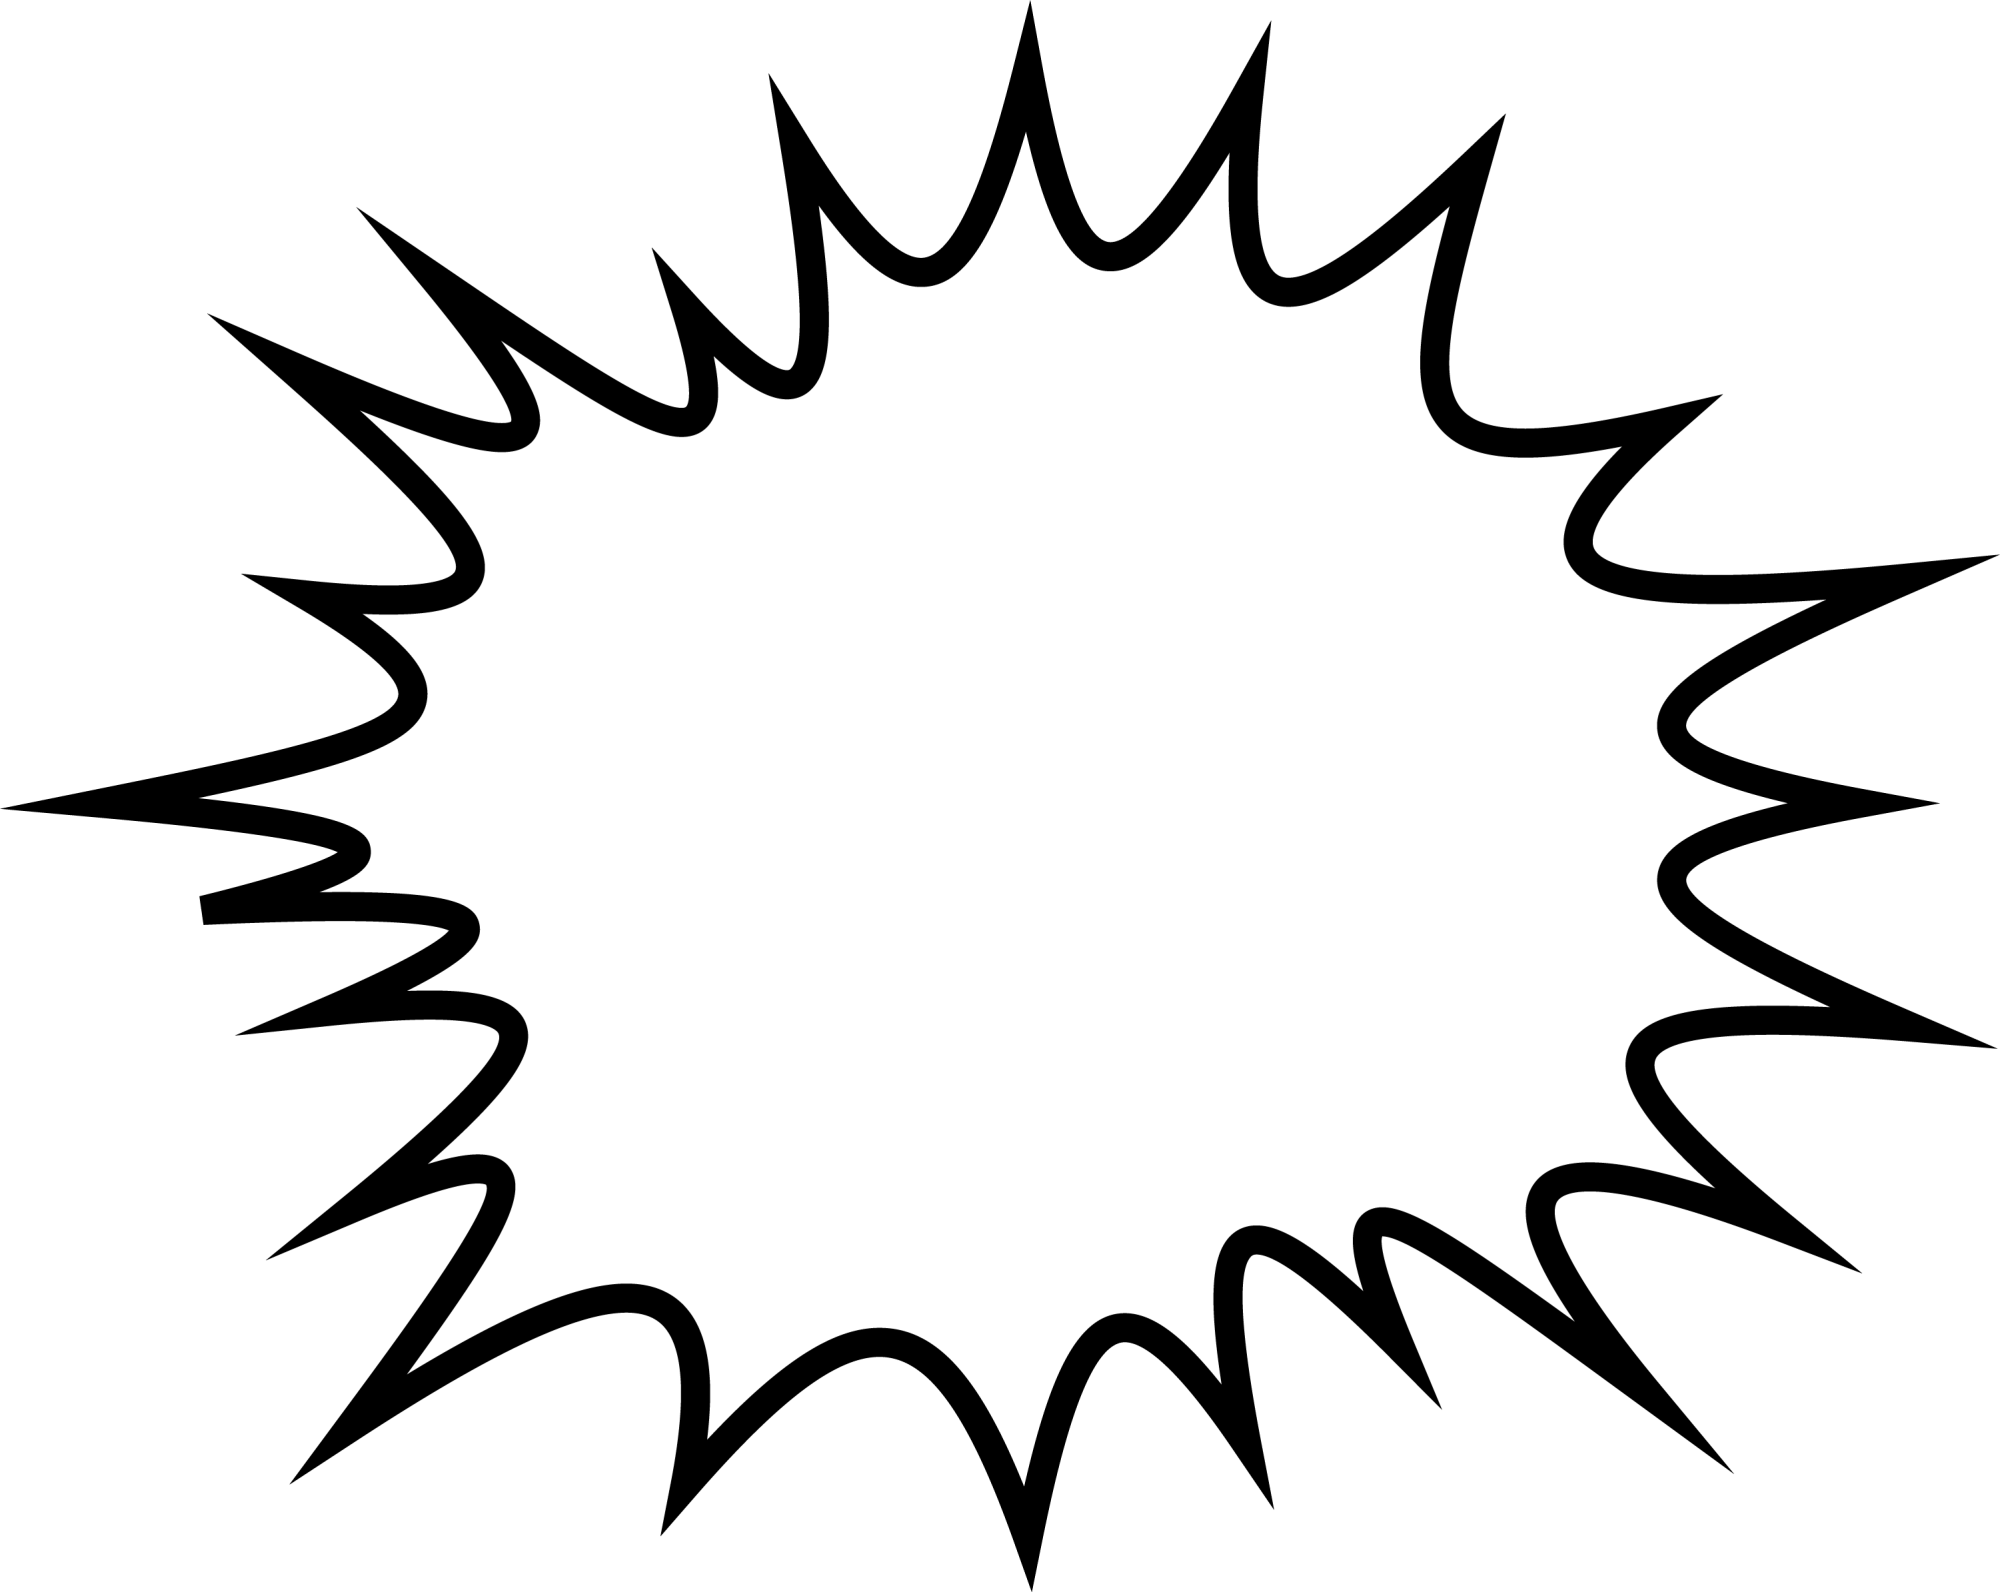 Clipart Explosion Leaf Clipart Explosion Leaf Transparent